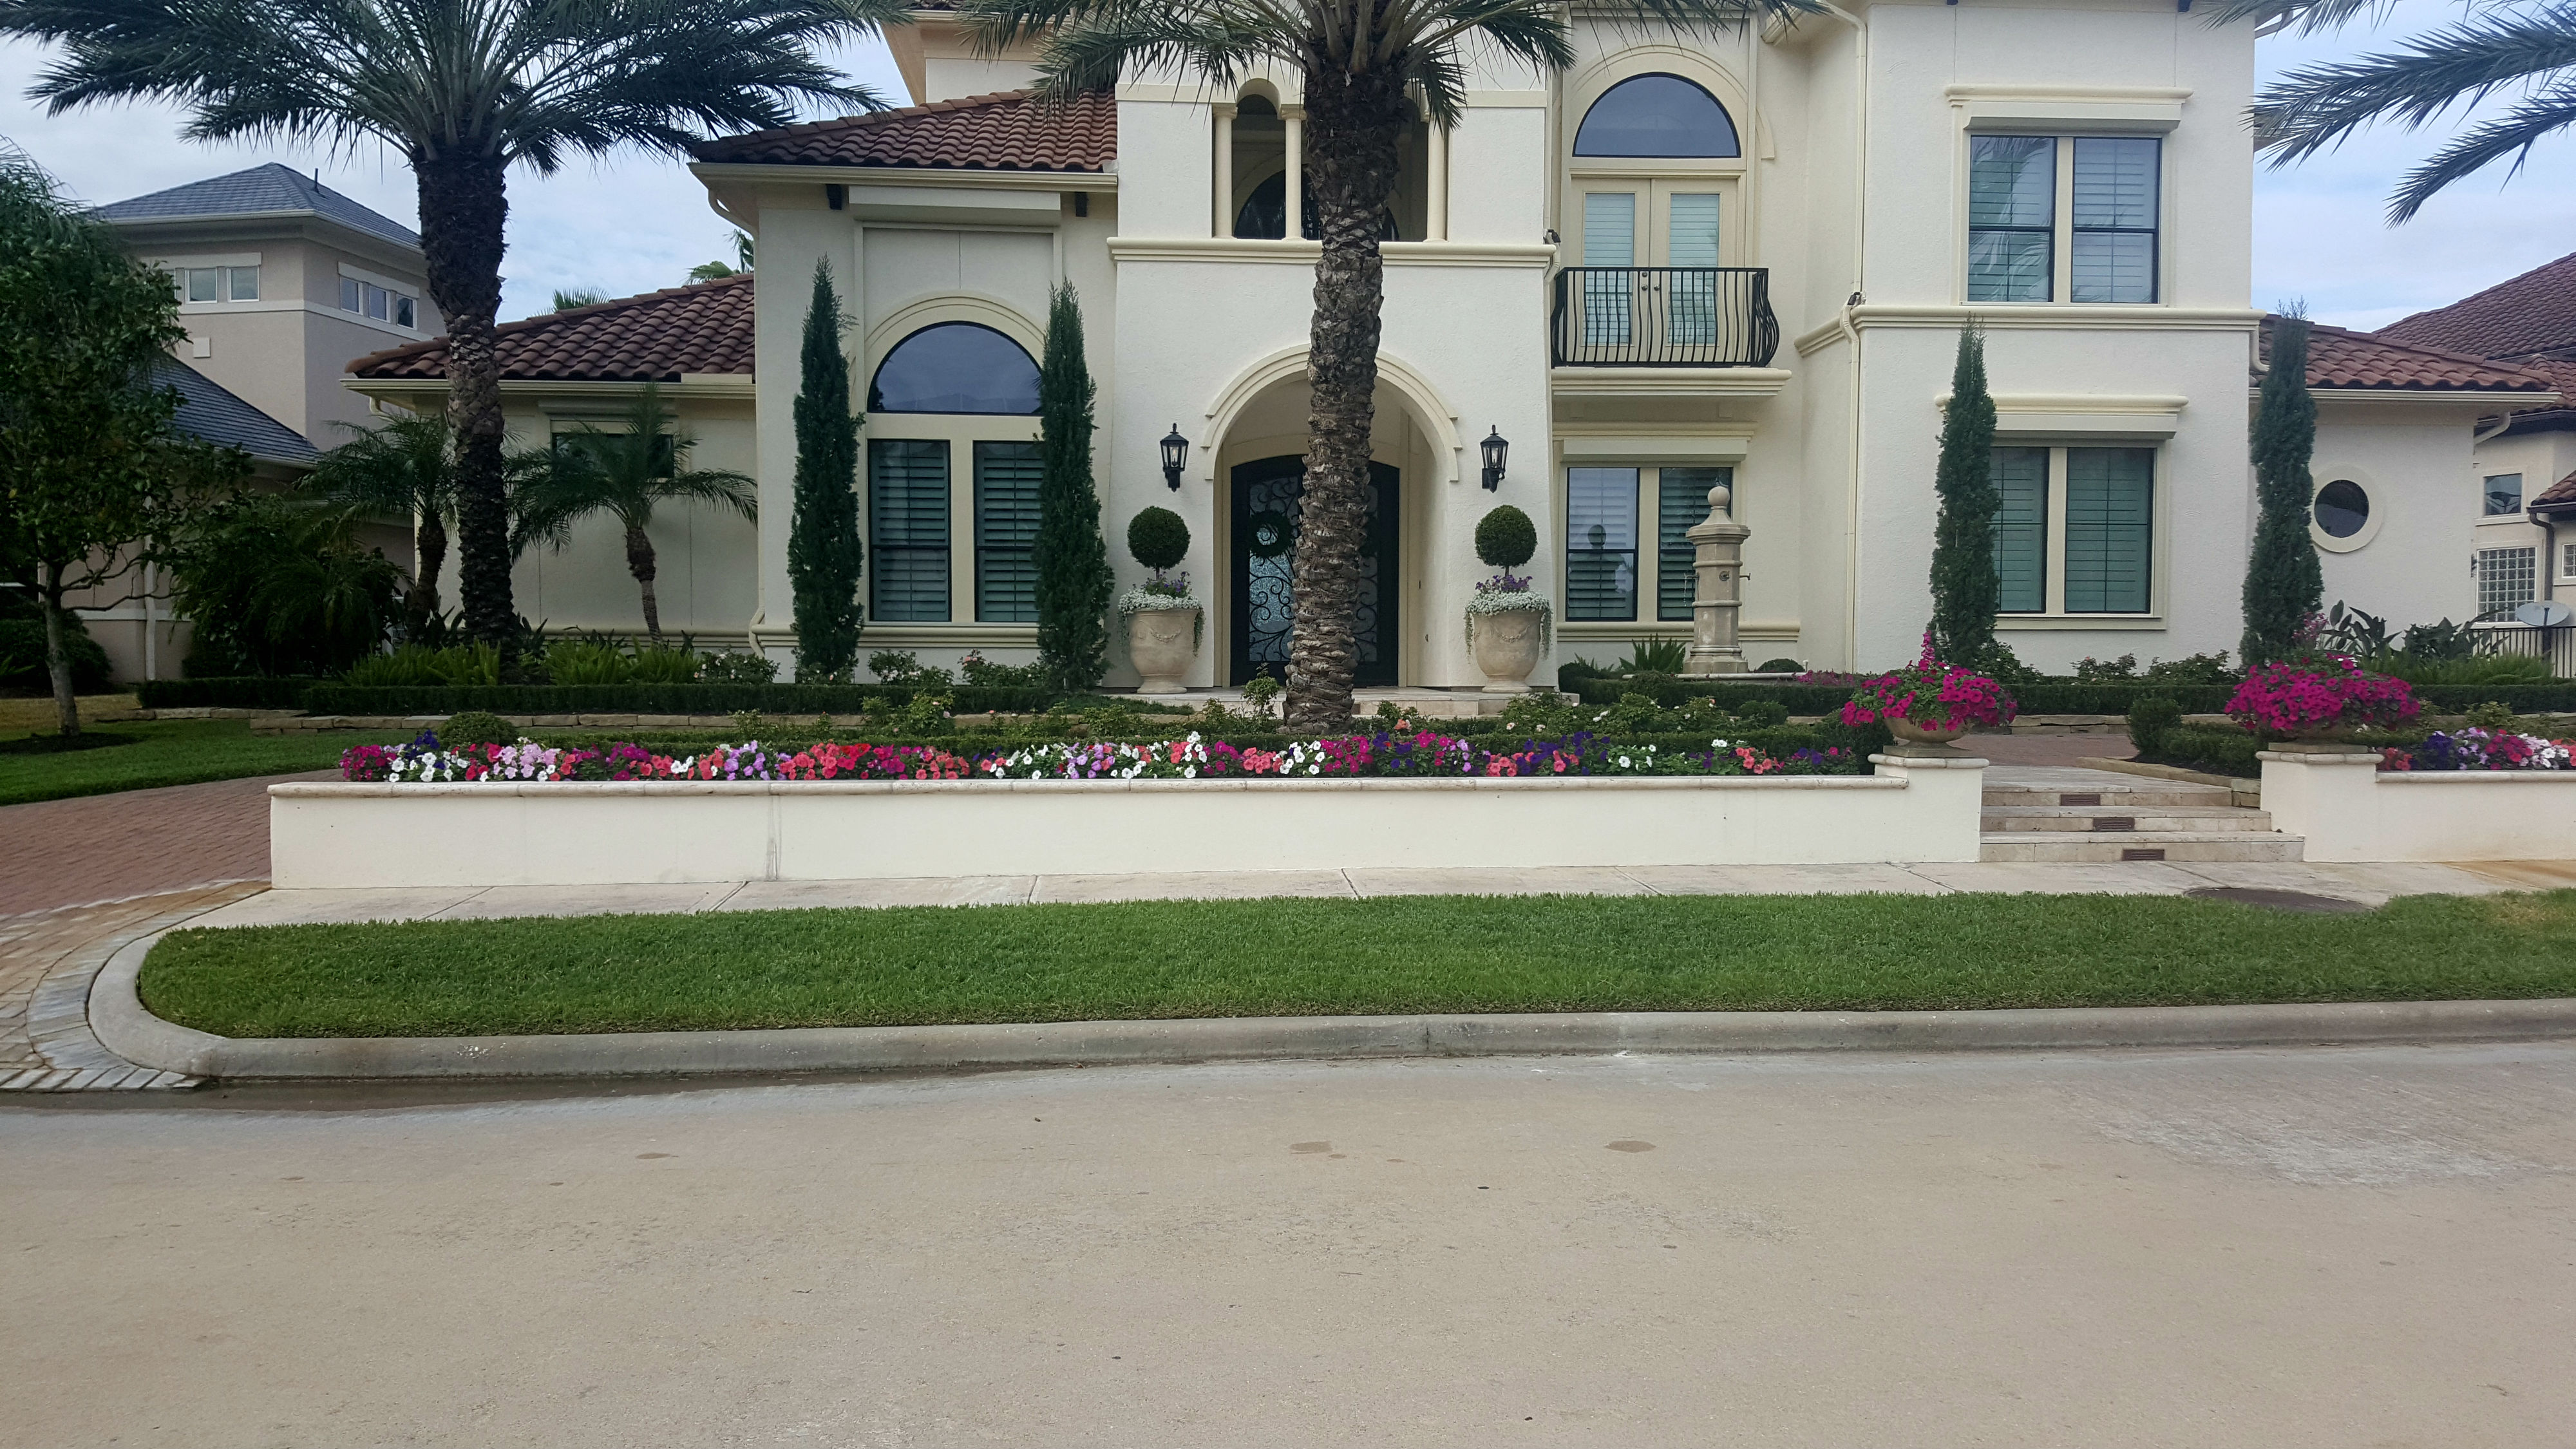 front yard design, Mediterranean, petunias